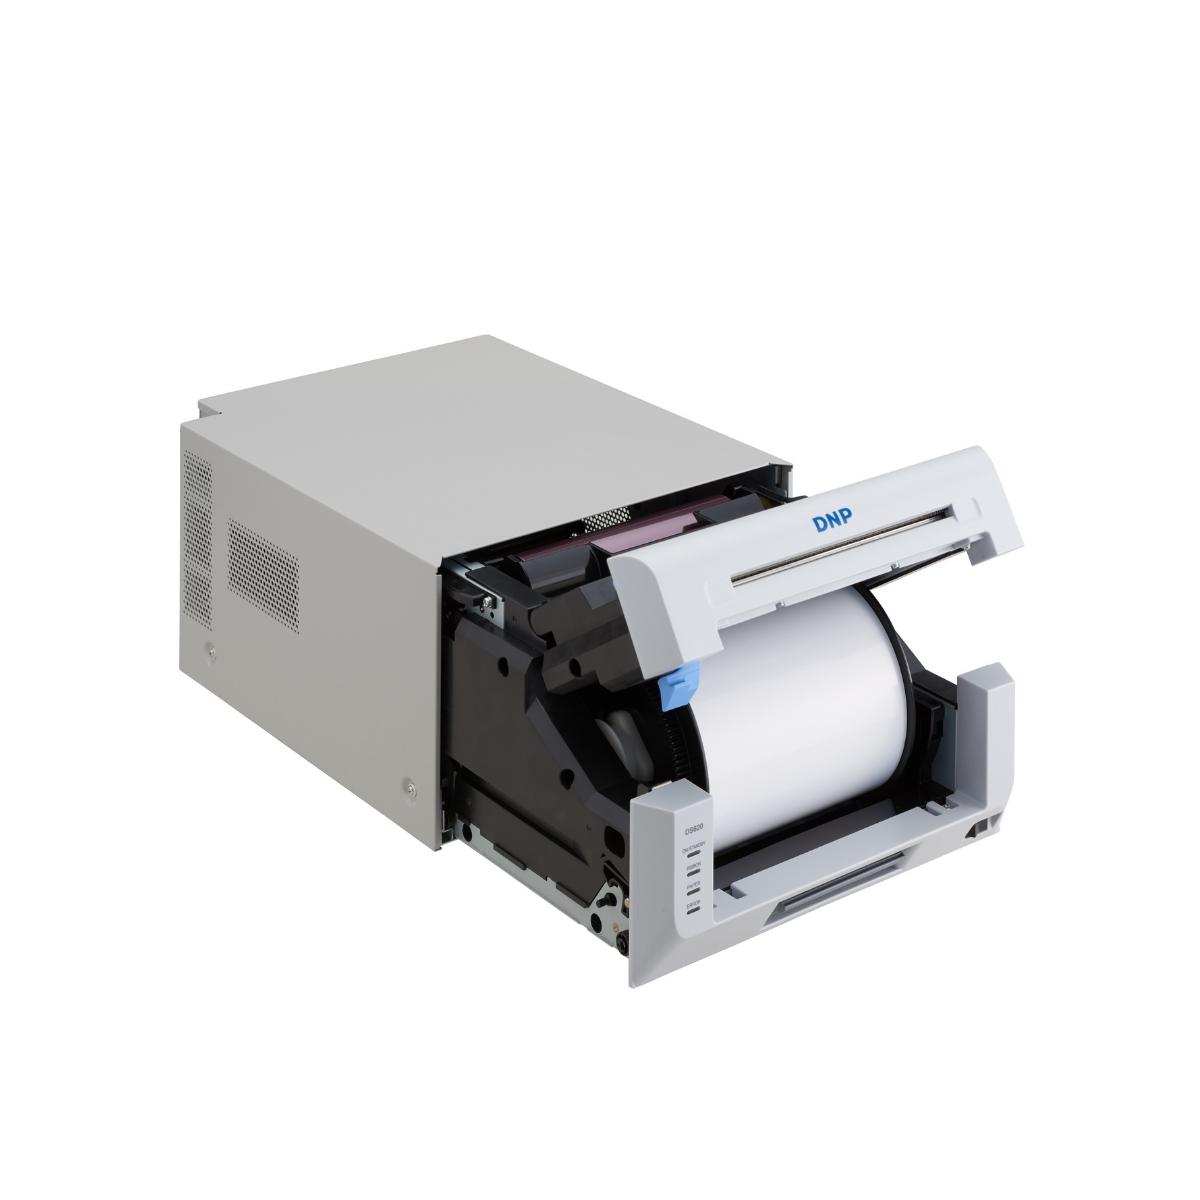 DNP DS 620 Impresora Térmica